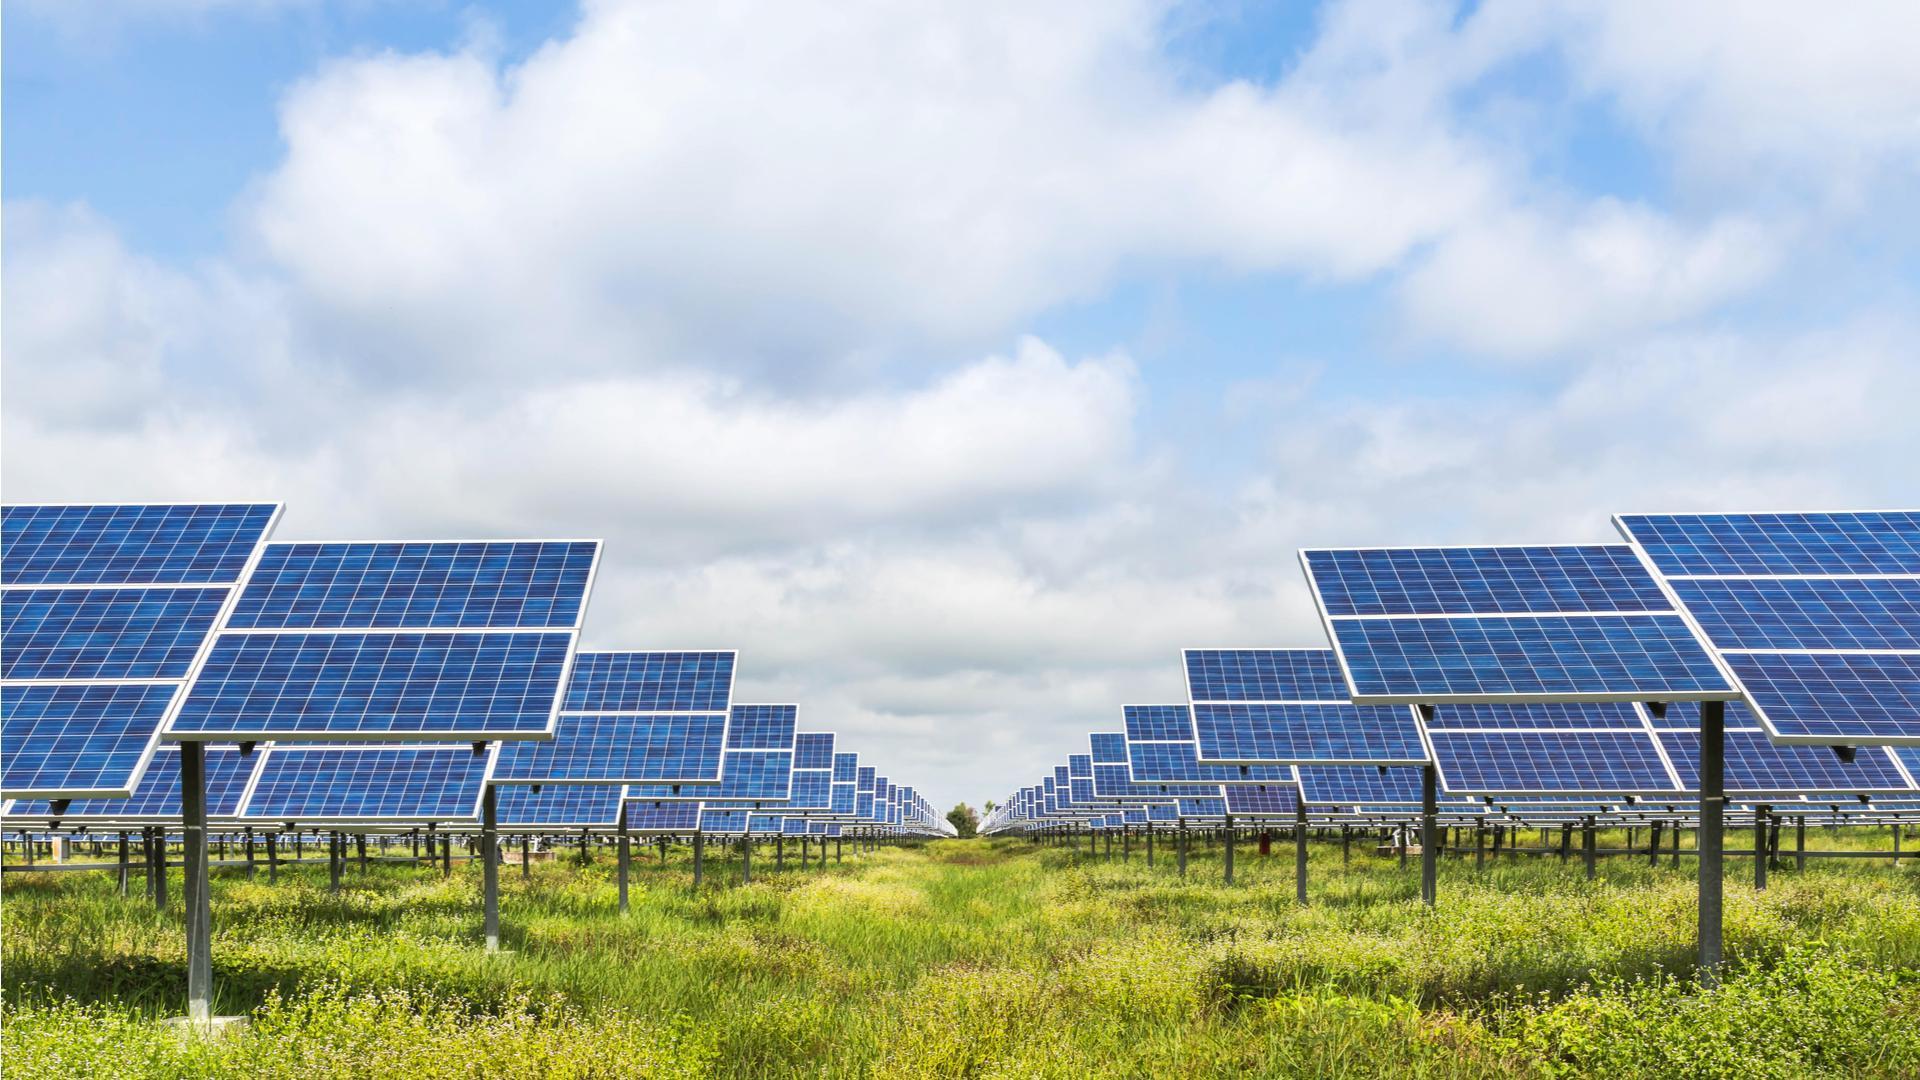 Solarpanil: Solar Panel Wallpapers